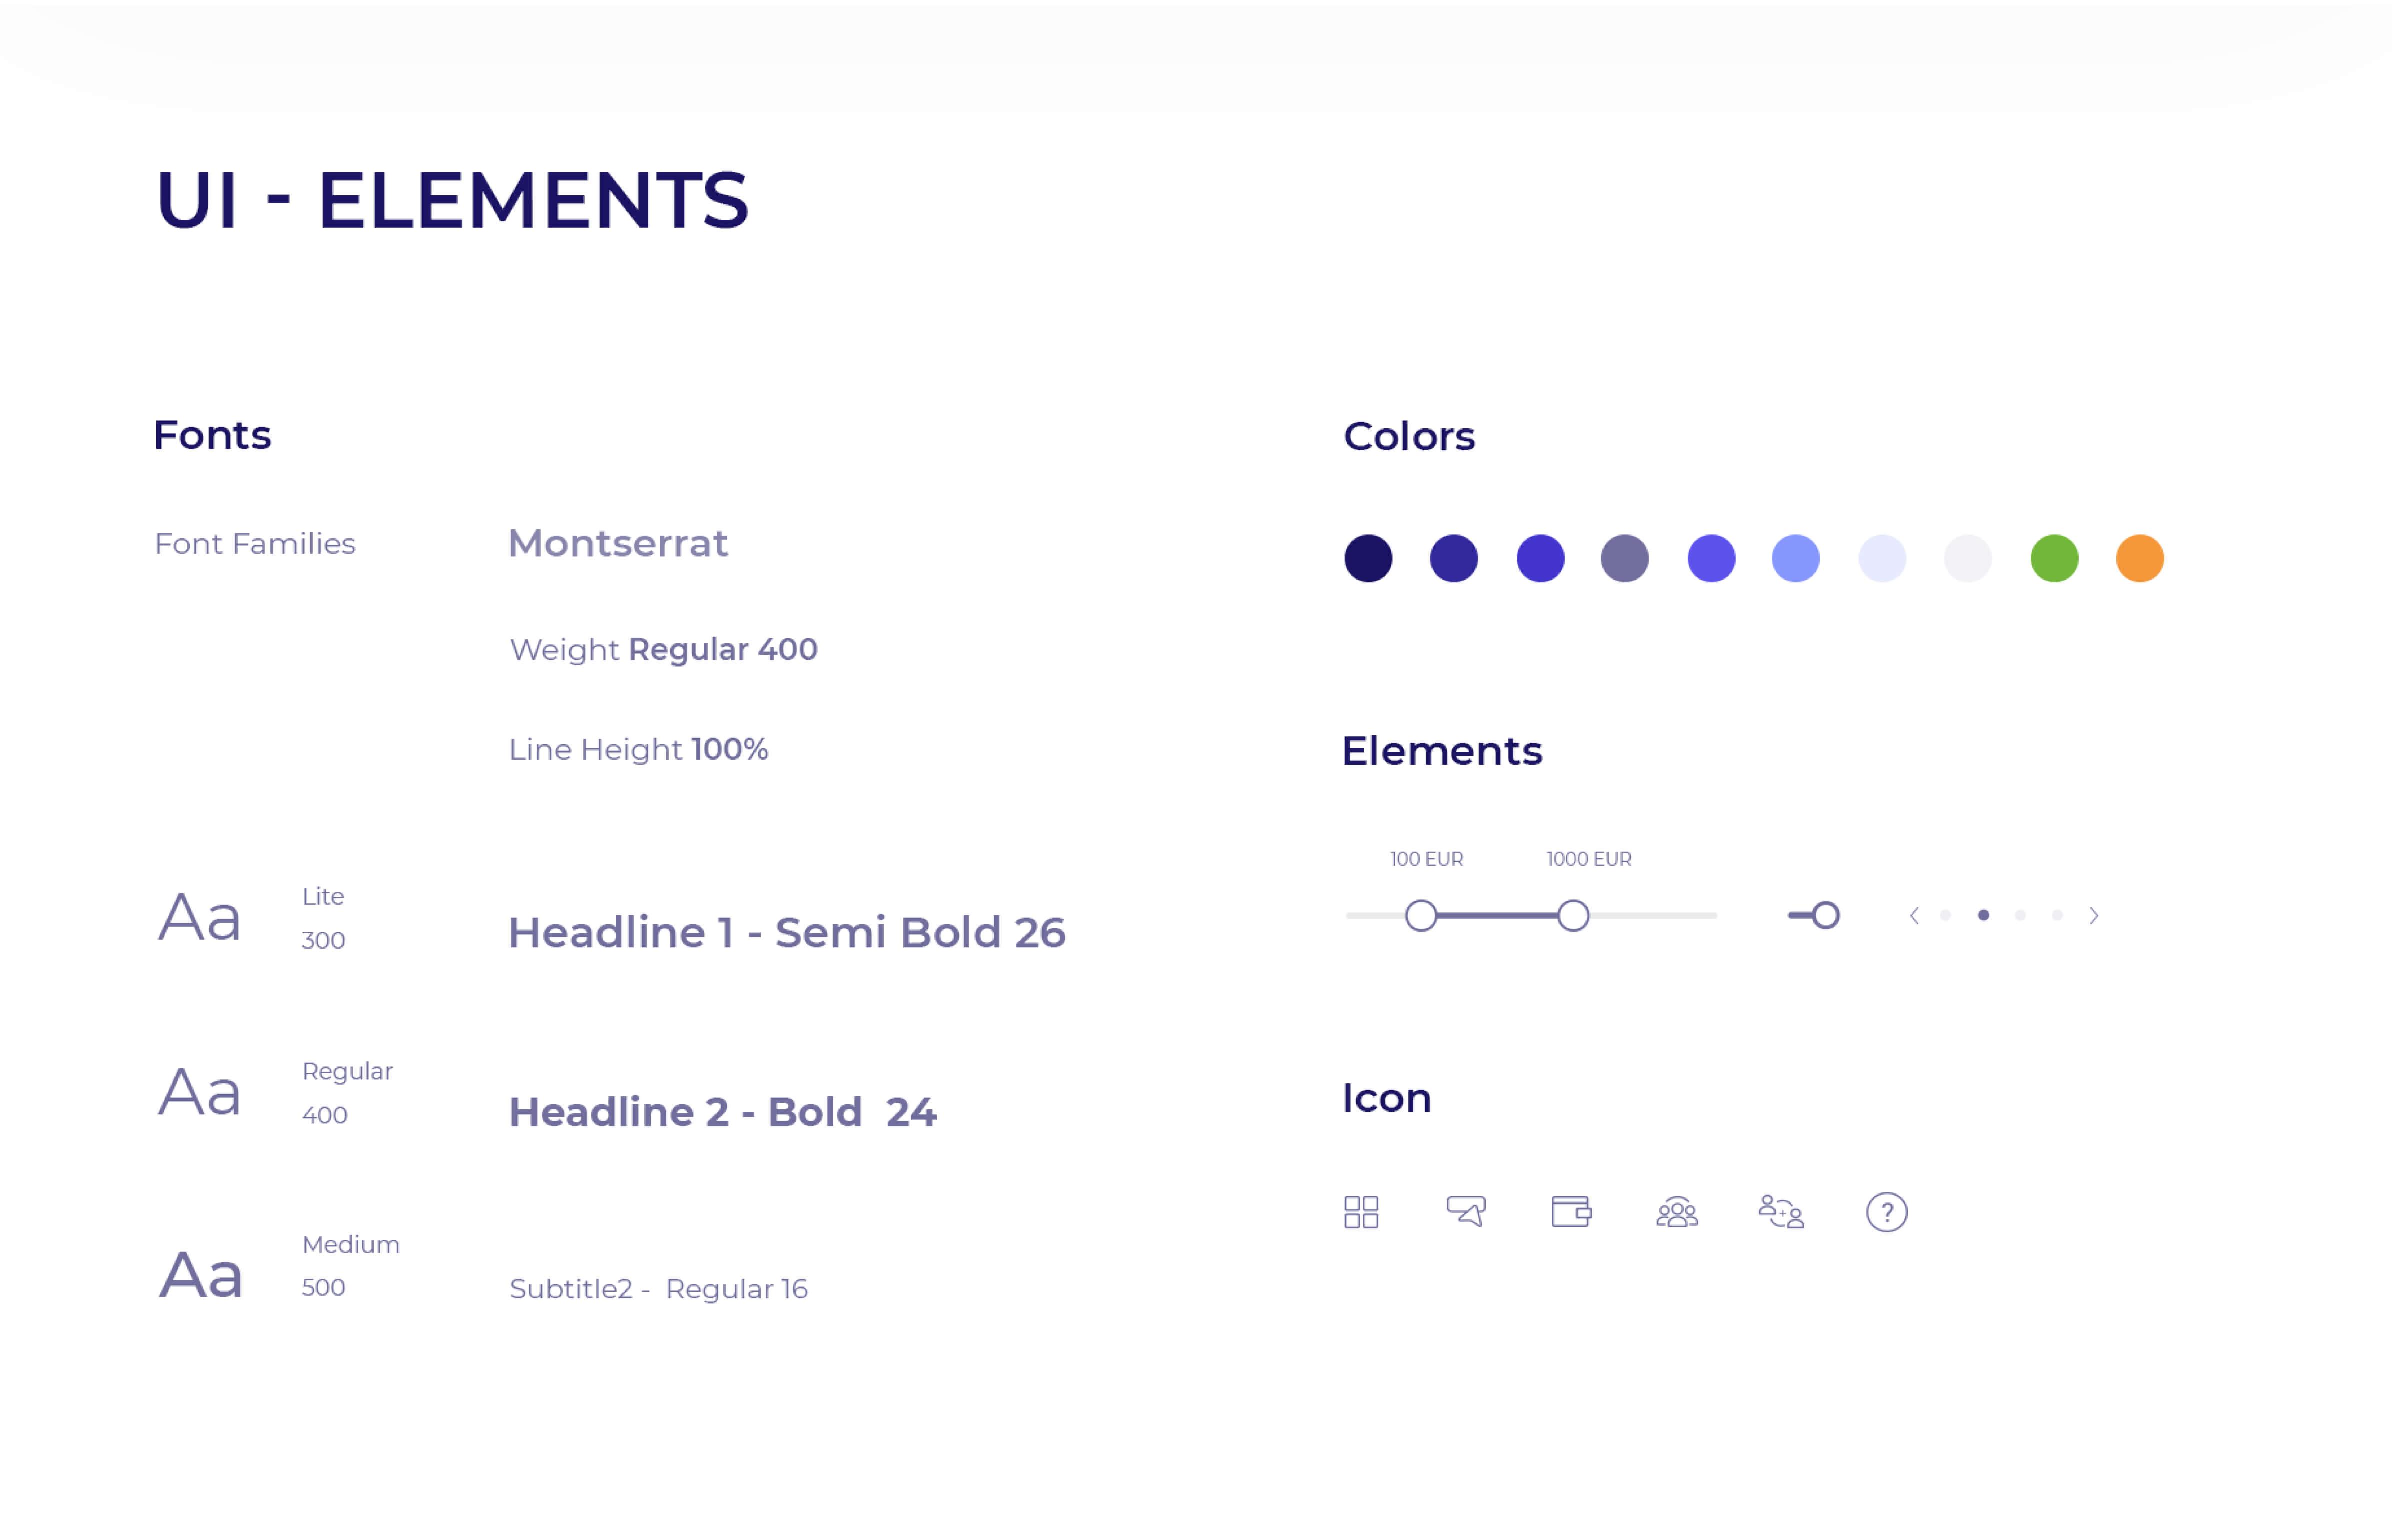 UMS UI-Elements